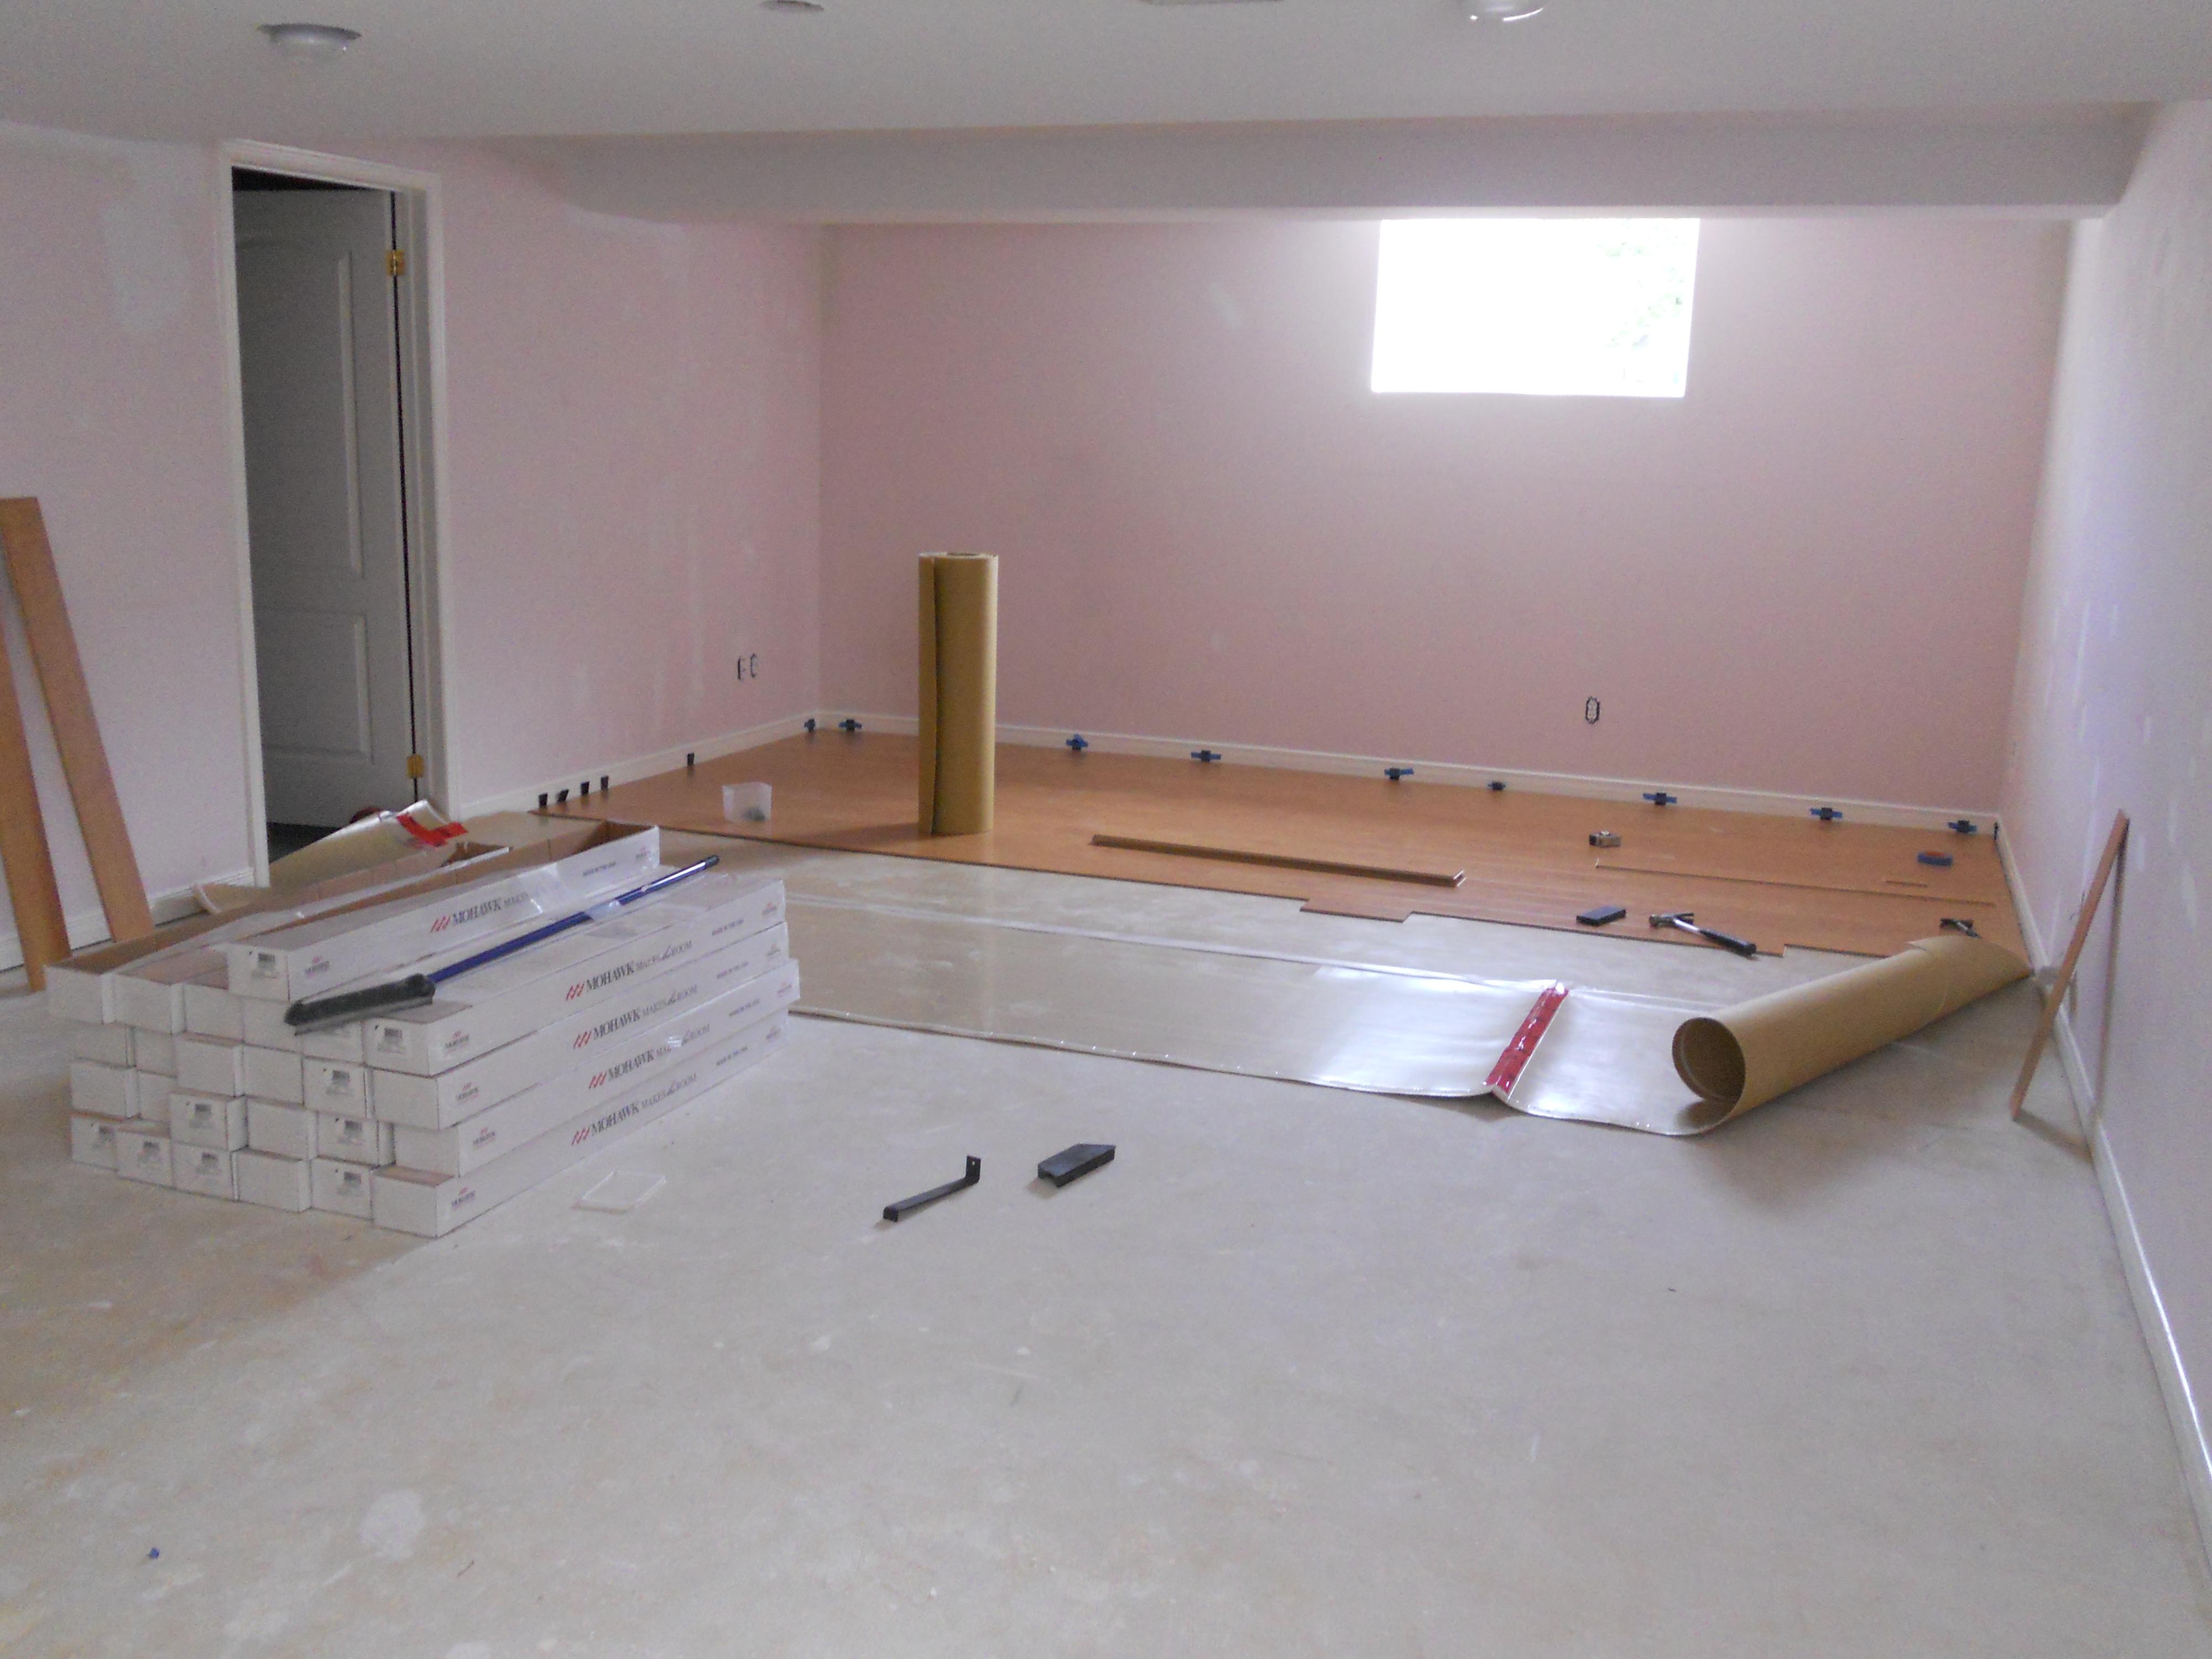 samples home basements painting floor arsenault improvement installation laminate